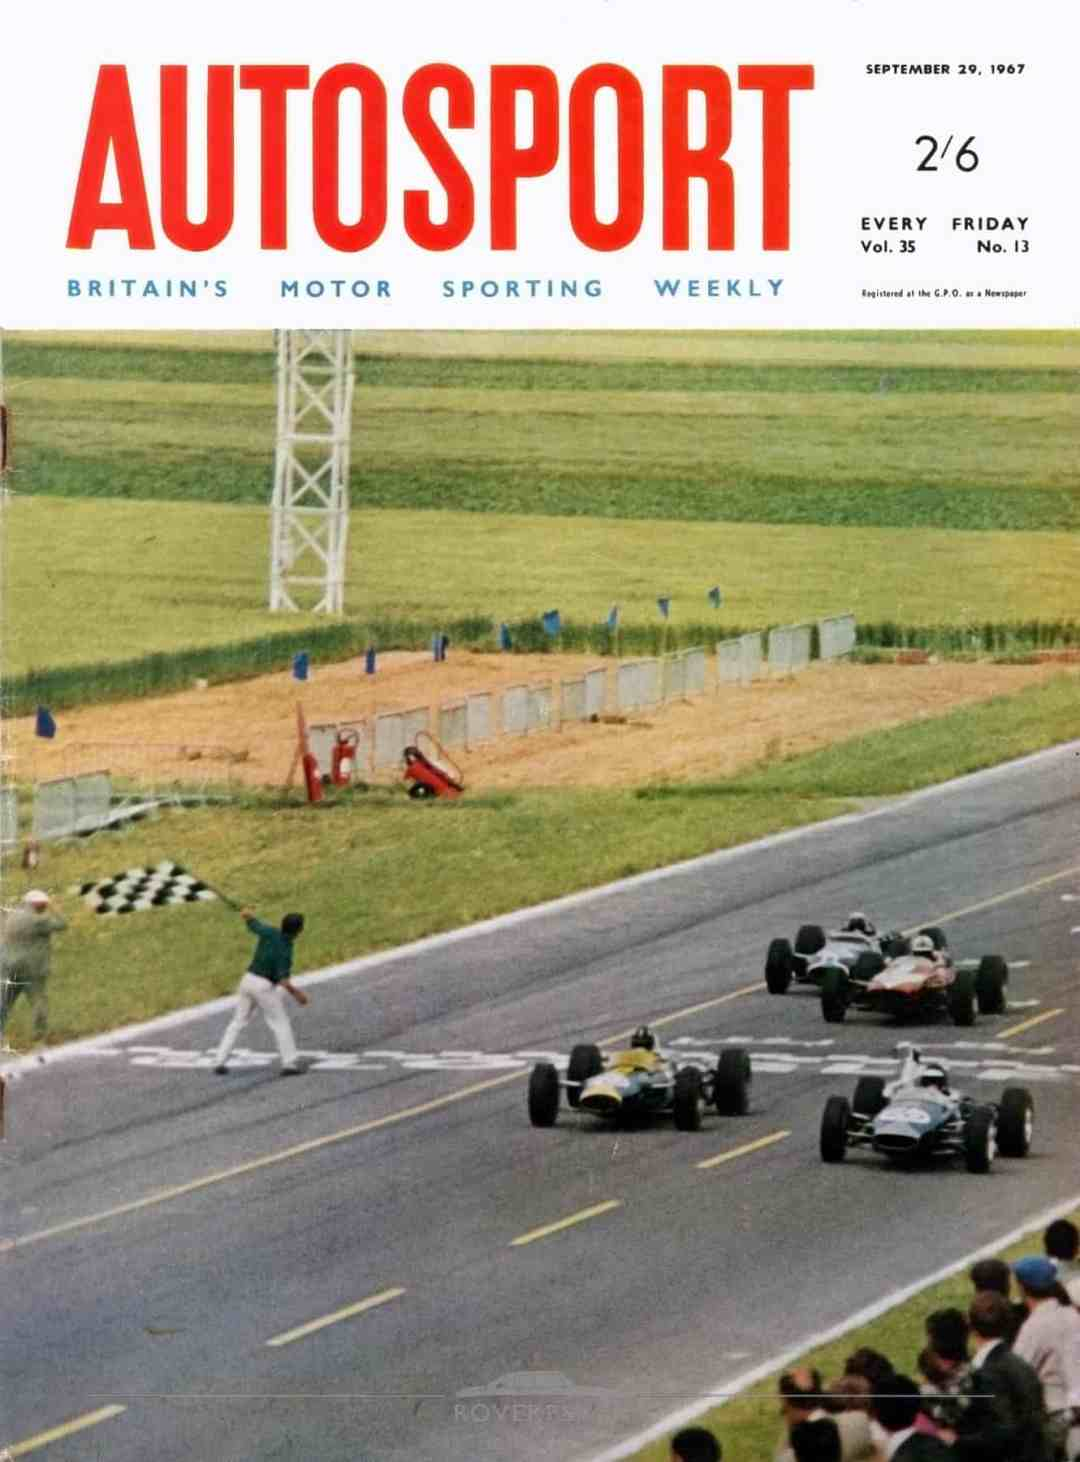 Magazine - 19670929 - Autosport - Front Cover (restored)